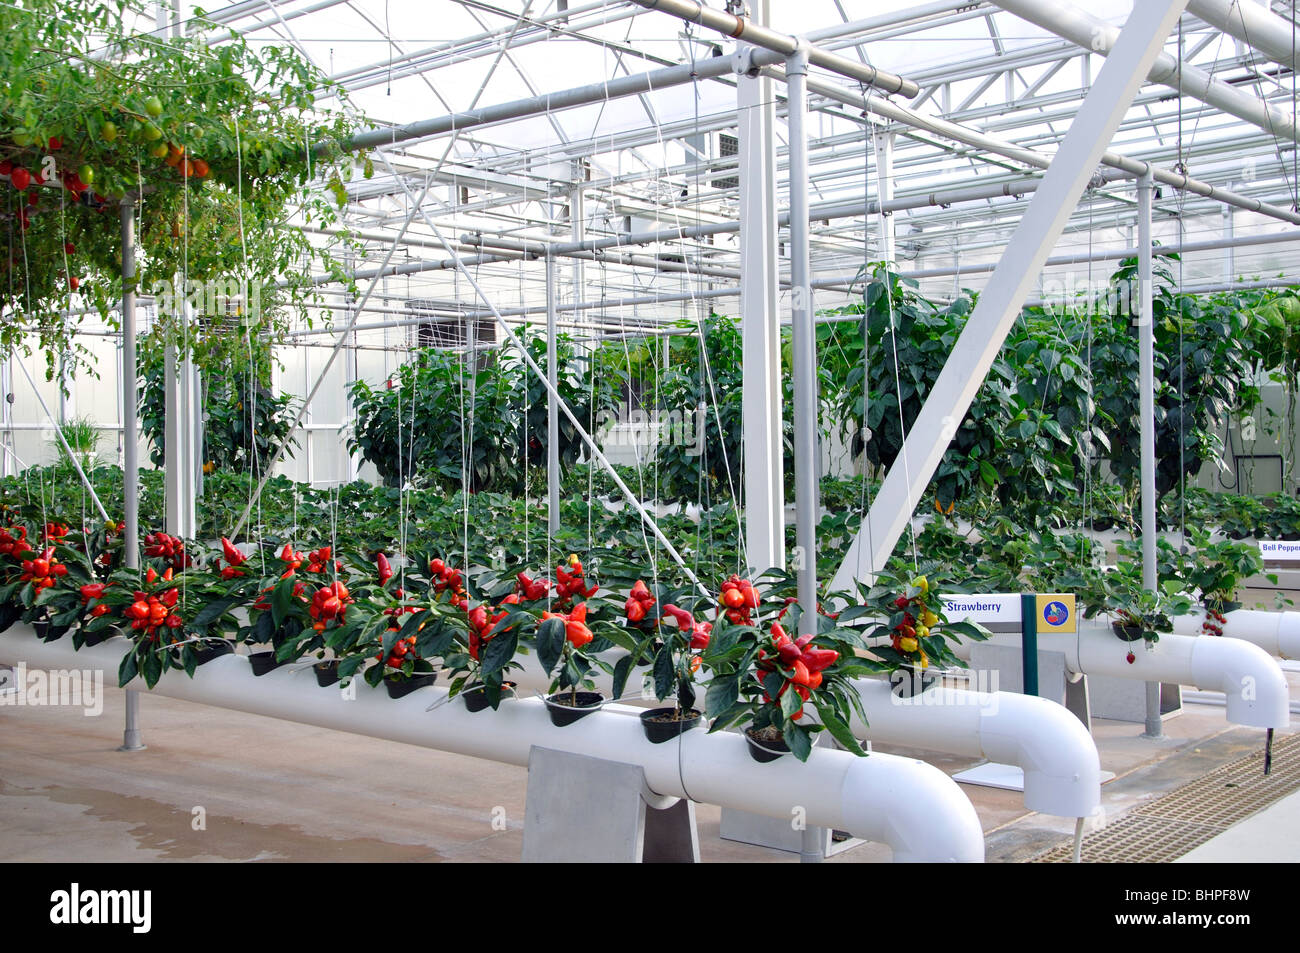 Hydroponic garden at Epcot DisneyworldOrlando Florida USA